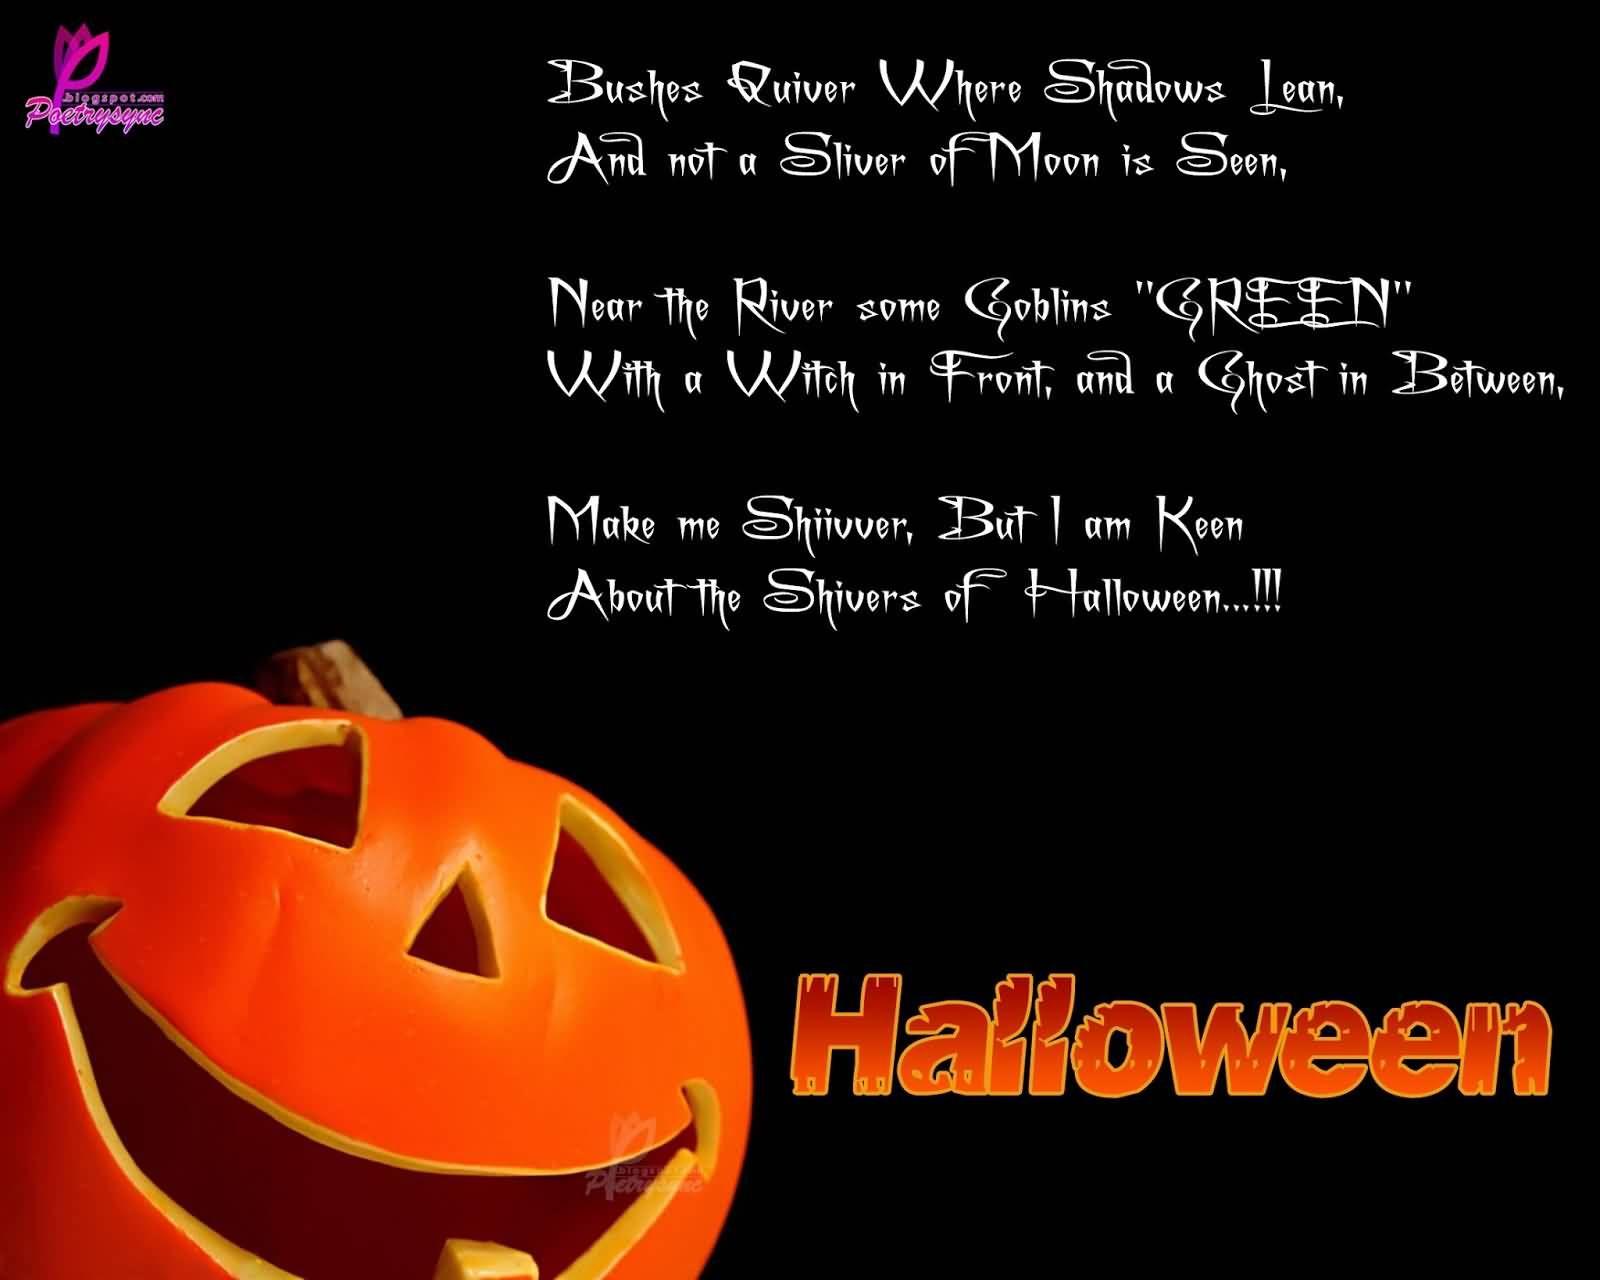 happy halloween greetings image